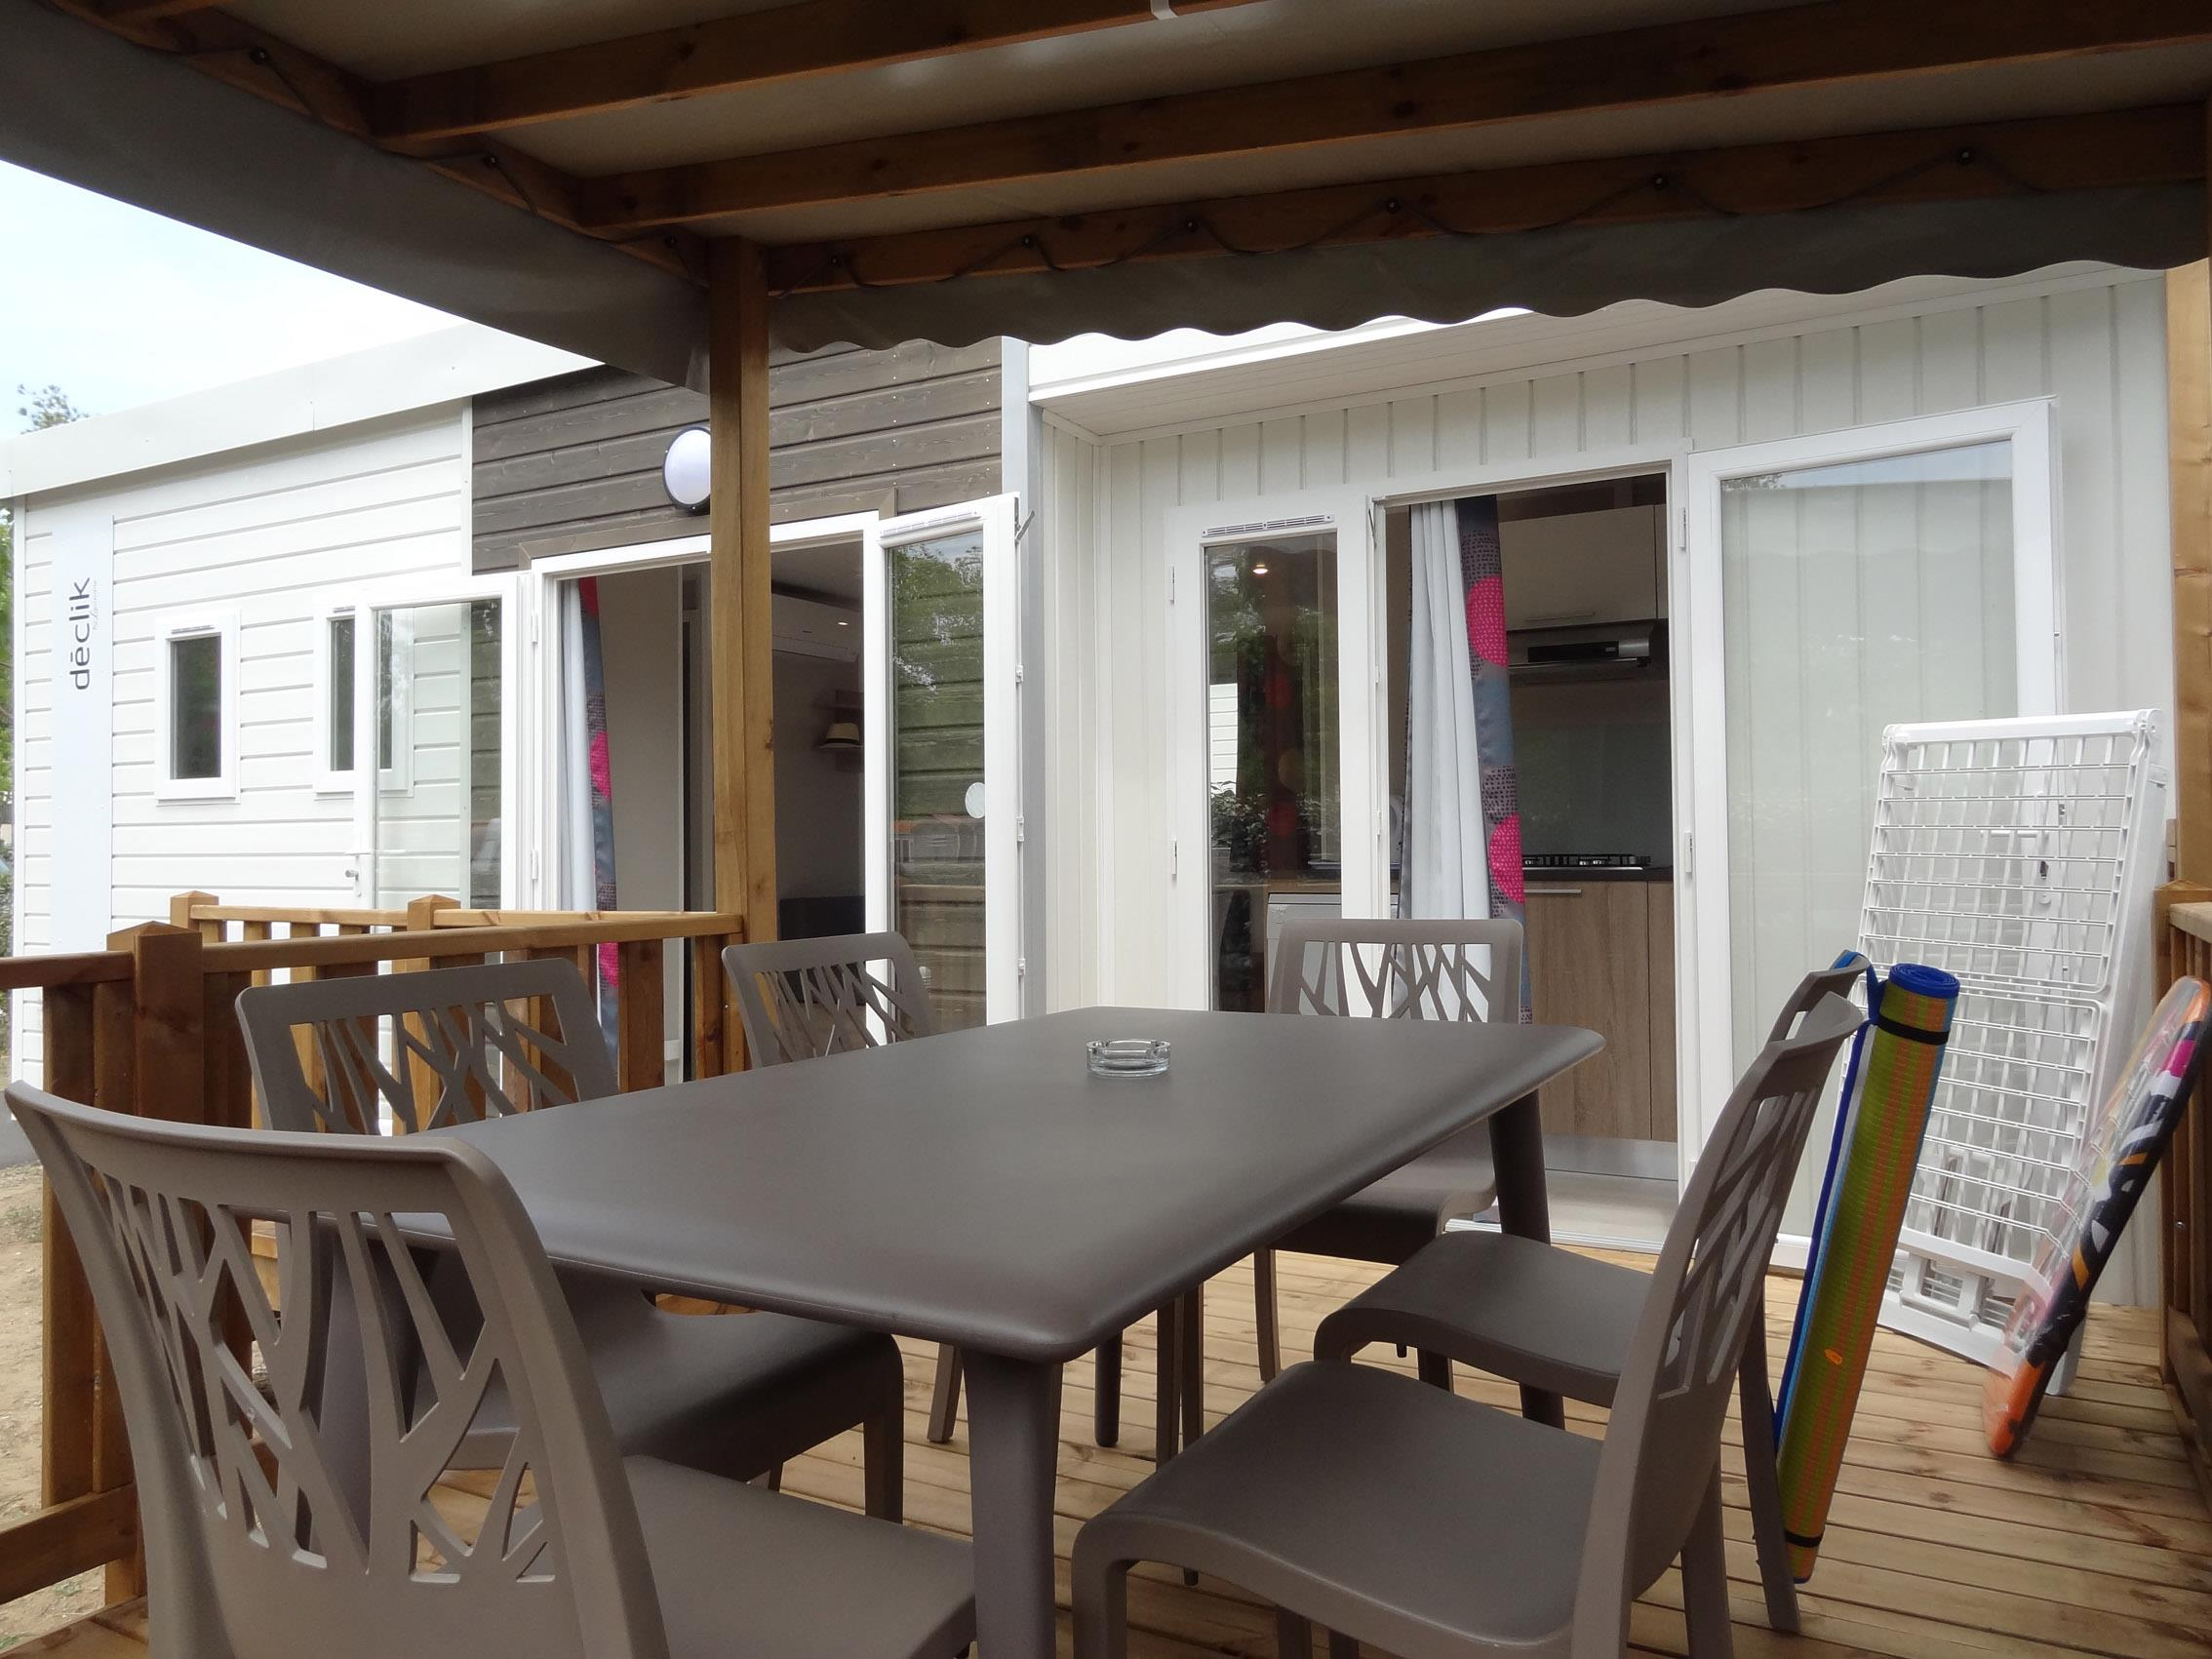 Mobil-home Confort + Declick Premium 32 m² - Clim/TV et lave-vaisselle - Samedi